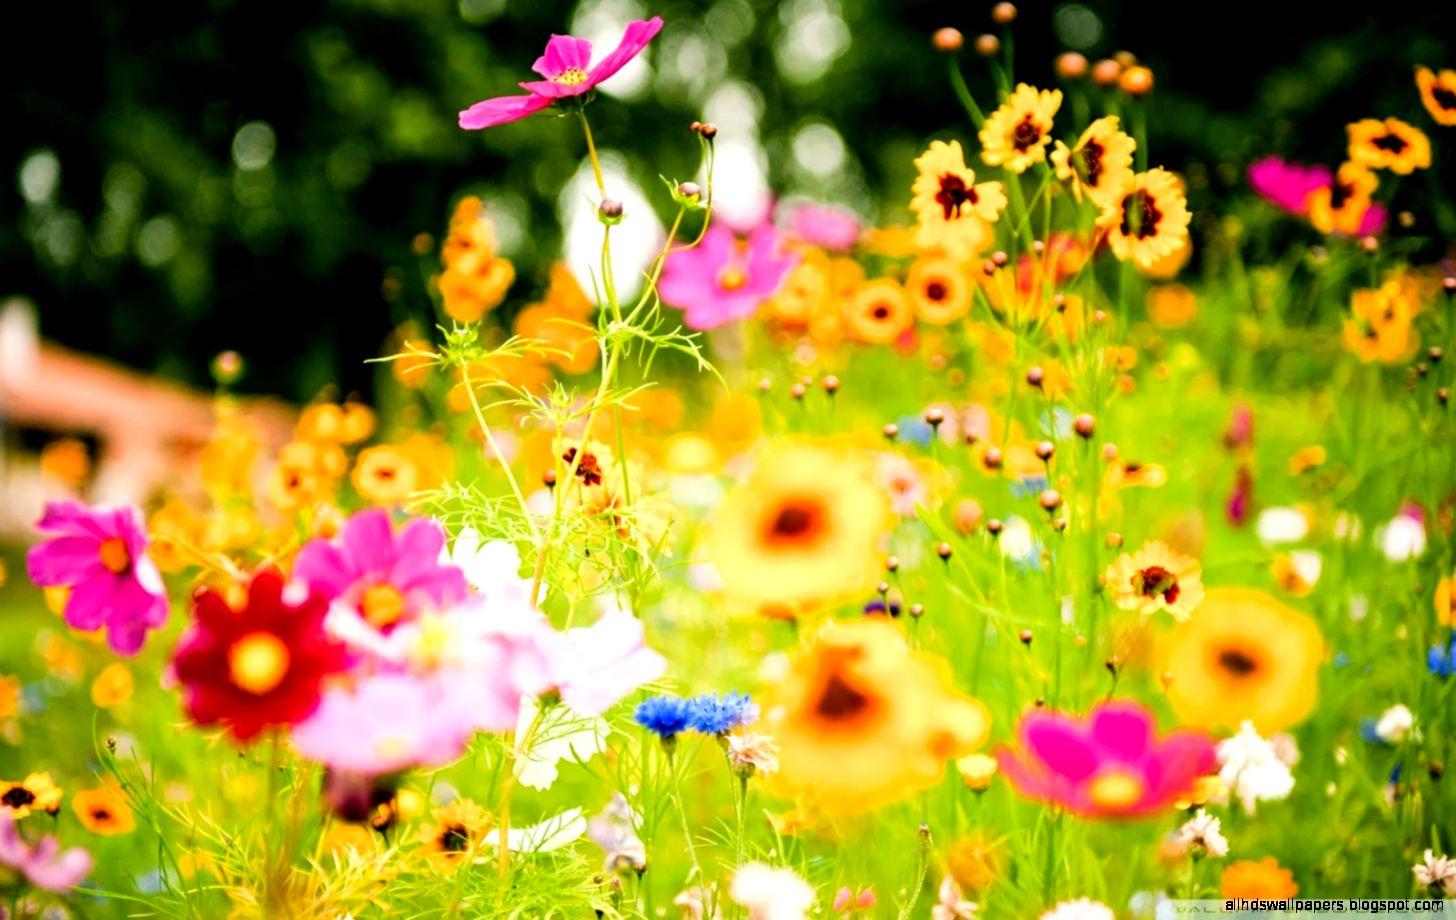 Summer Flowers Wallpapers  Free HD Desktop Wallpapers